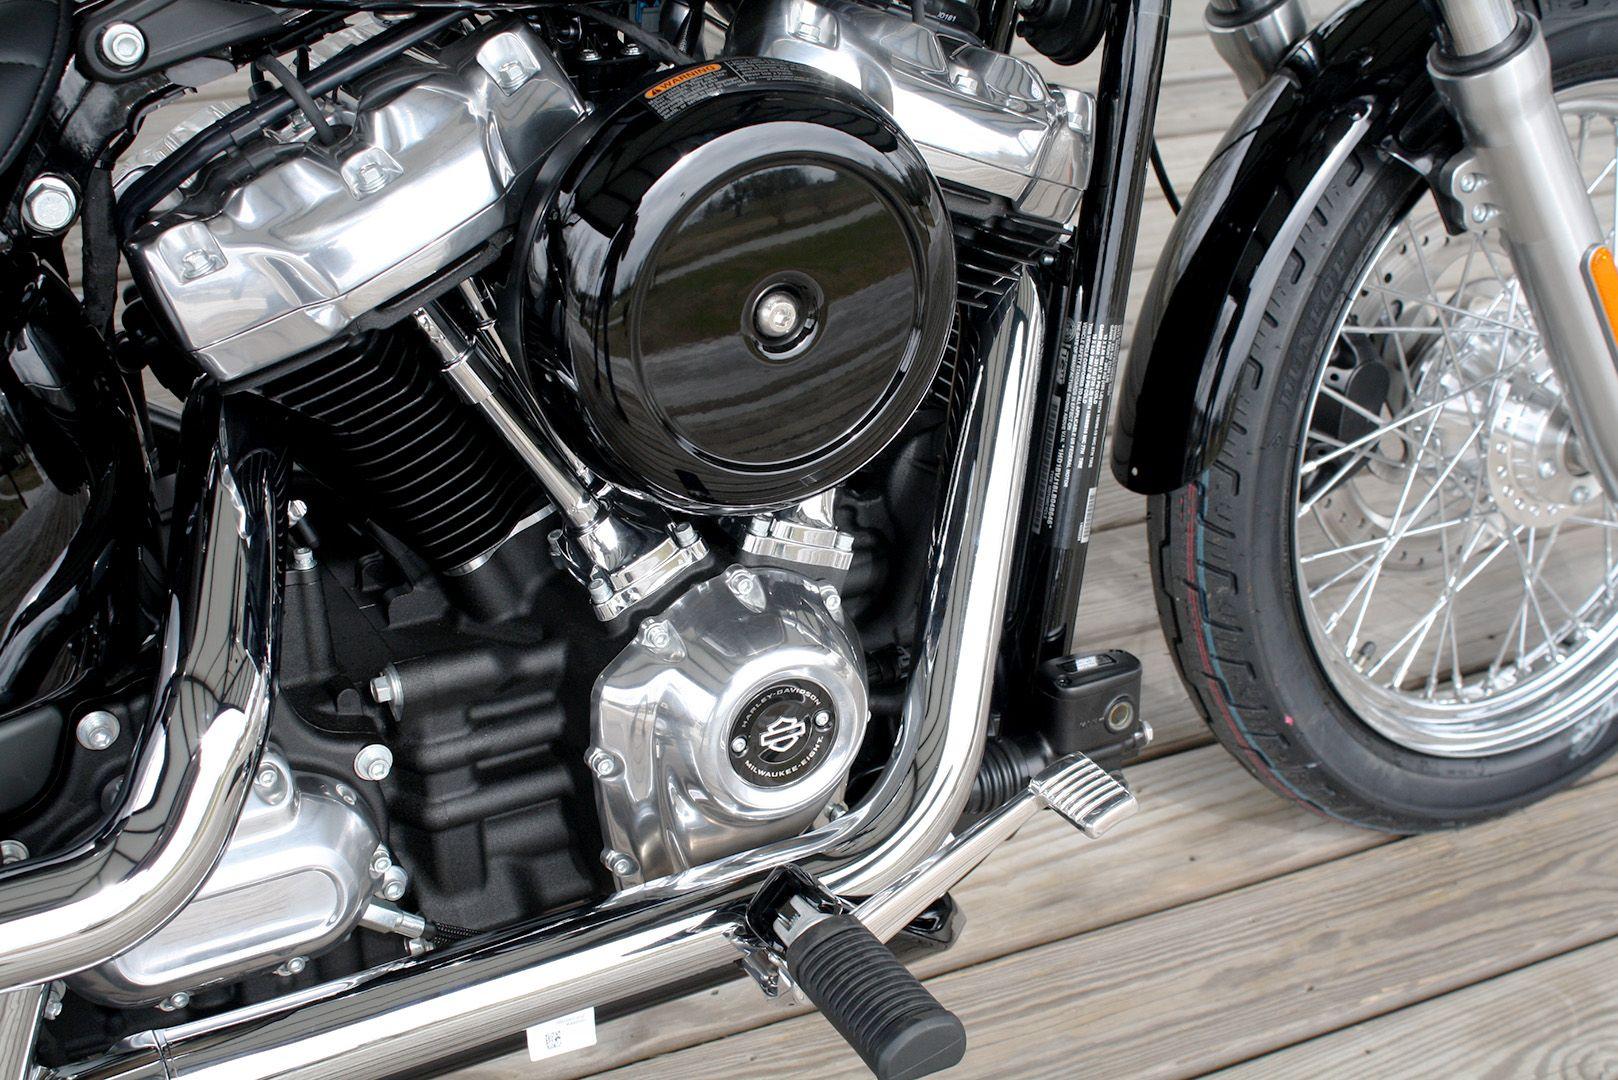 New 2020 Harley-Davidson Softail Standard